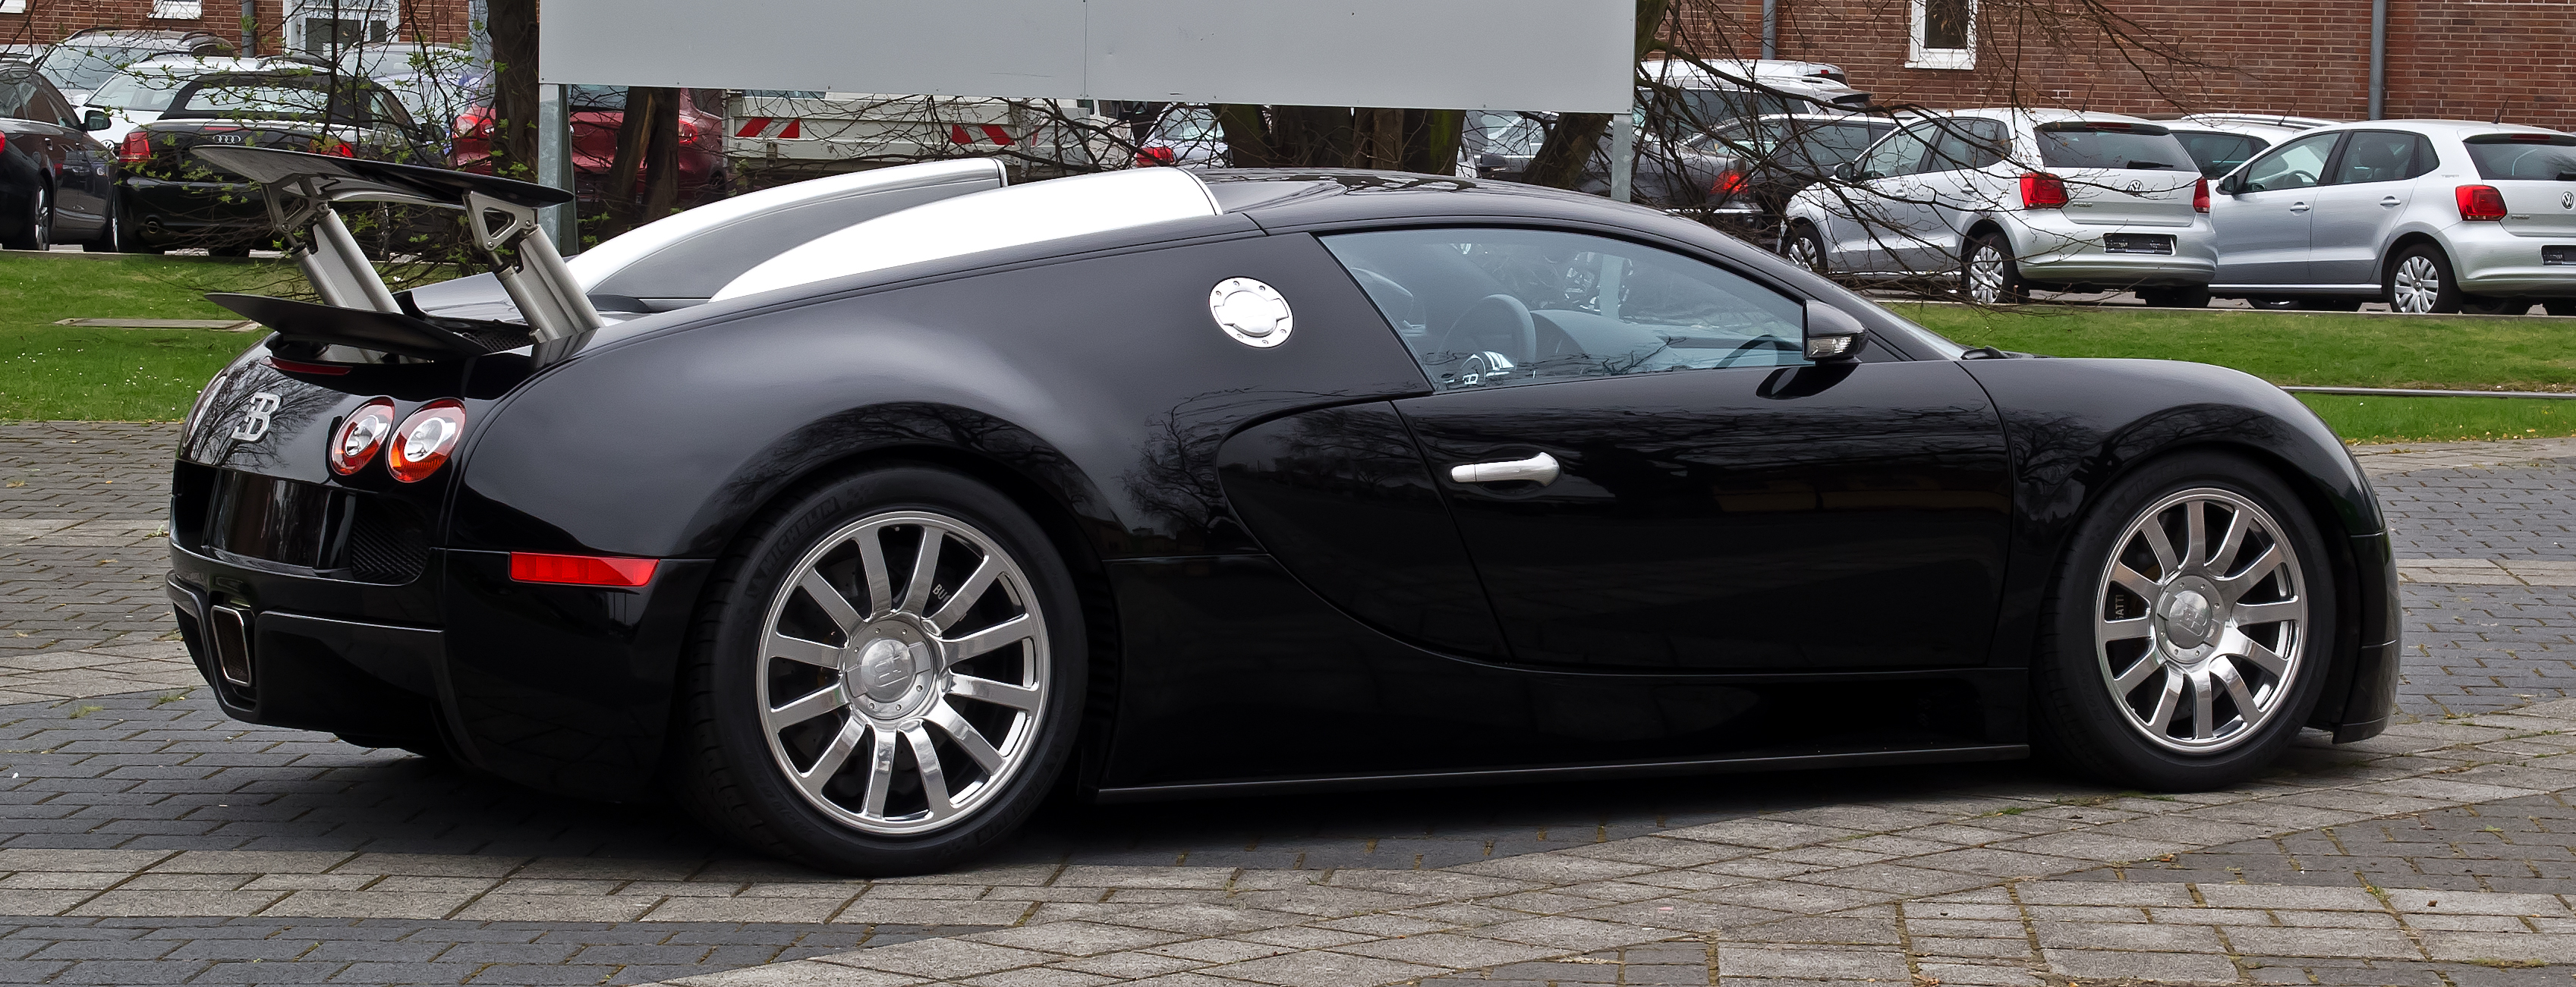 File:Bugatti Veyron 16.4 – Heckansicht, 5. April 2012, Düsseldorf ...